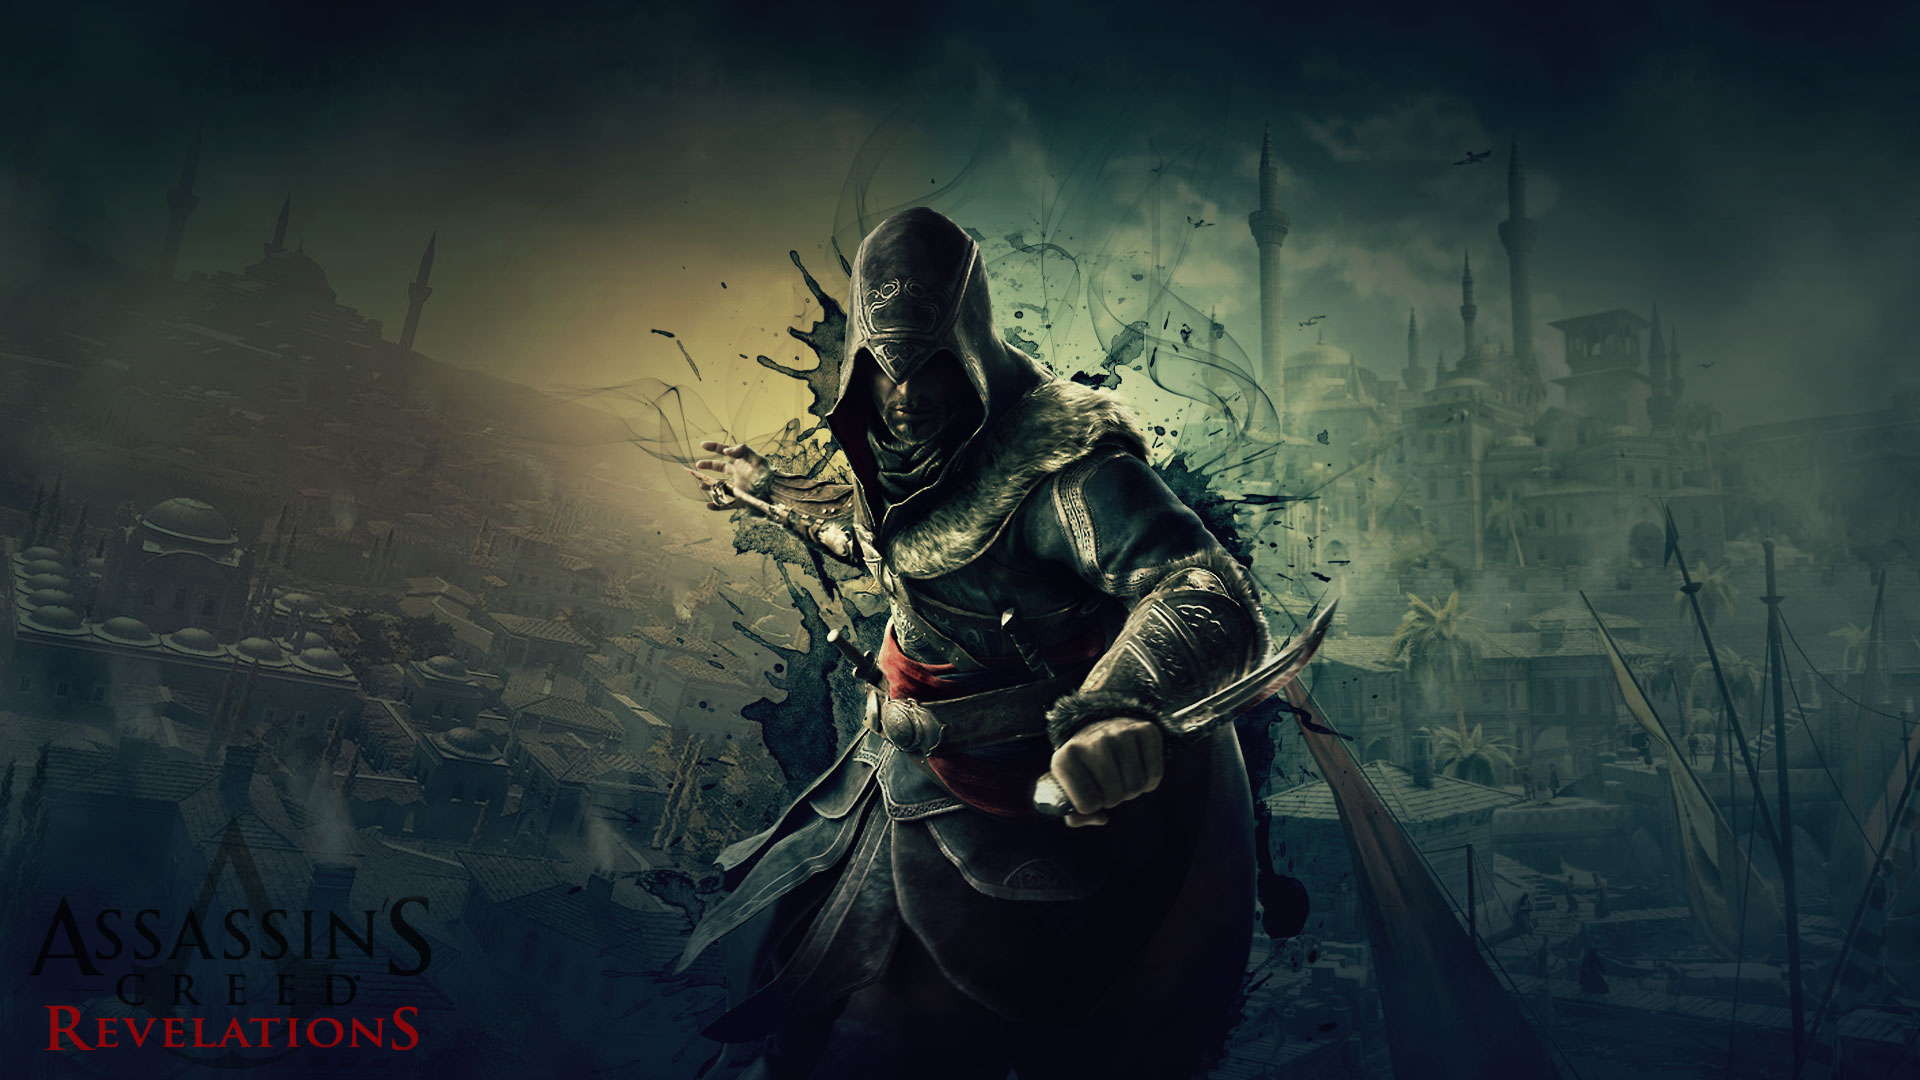 Assassin 39 s creed wallpaper hd 1080p wallpapersafari for Assassin s creed sfondi